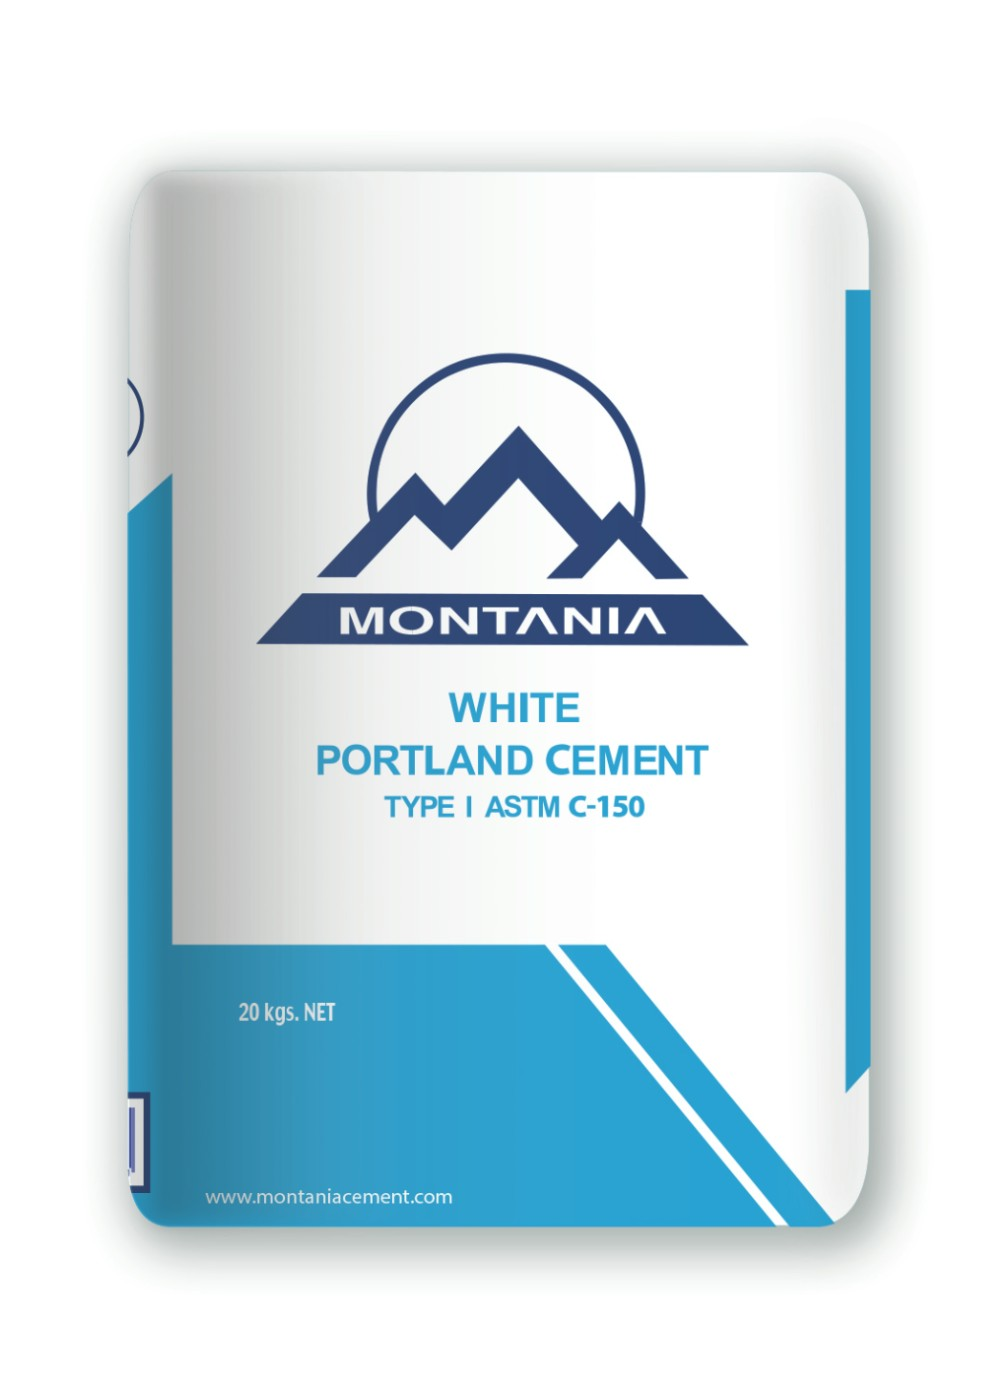 White cement Montania M1 White Pool Plastering